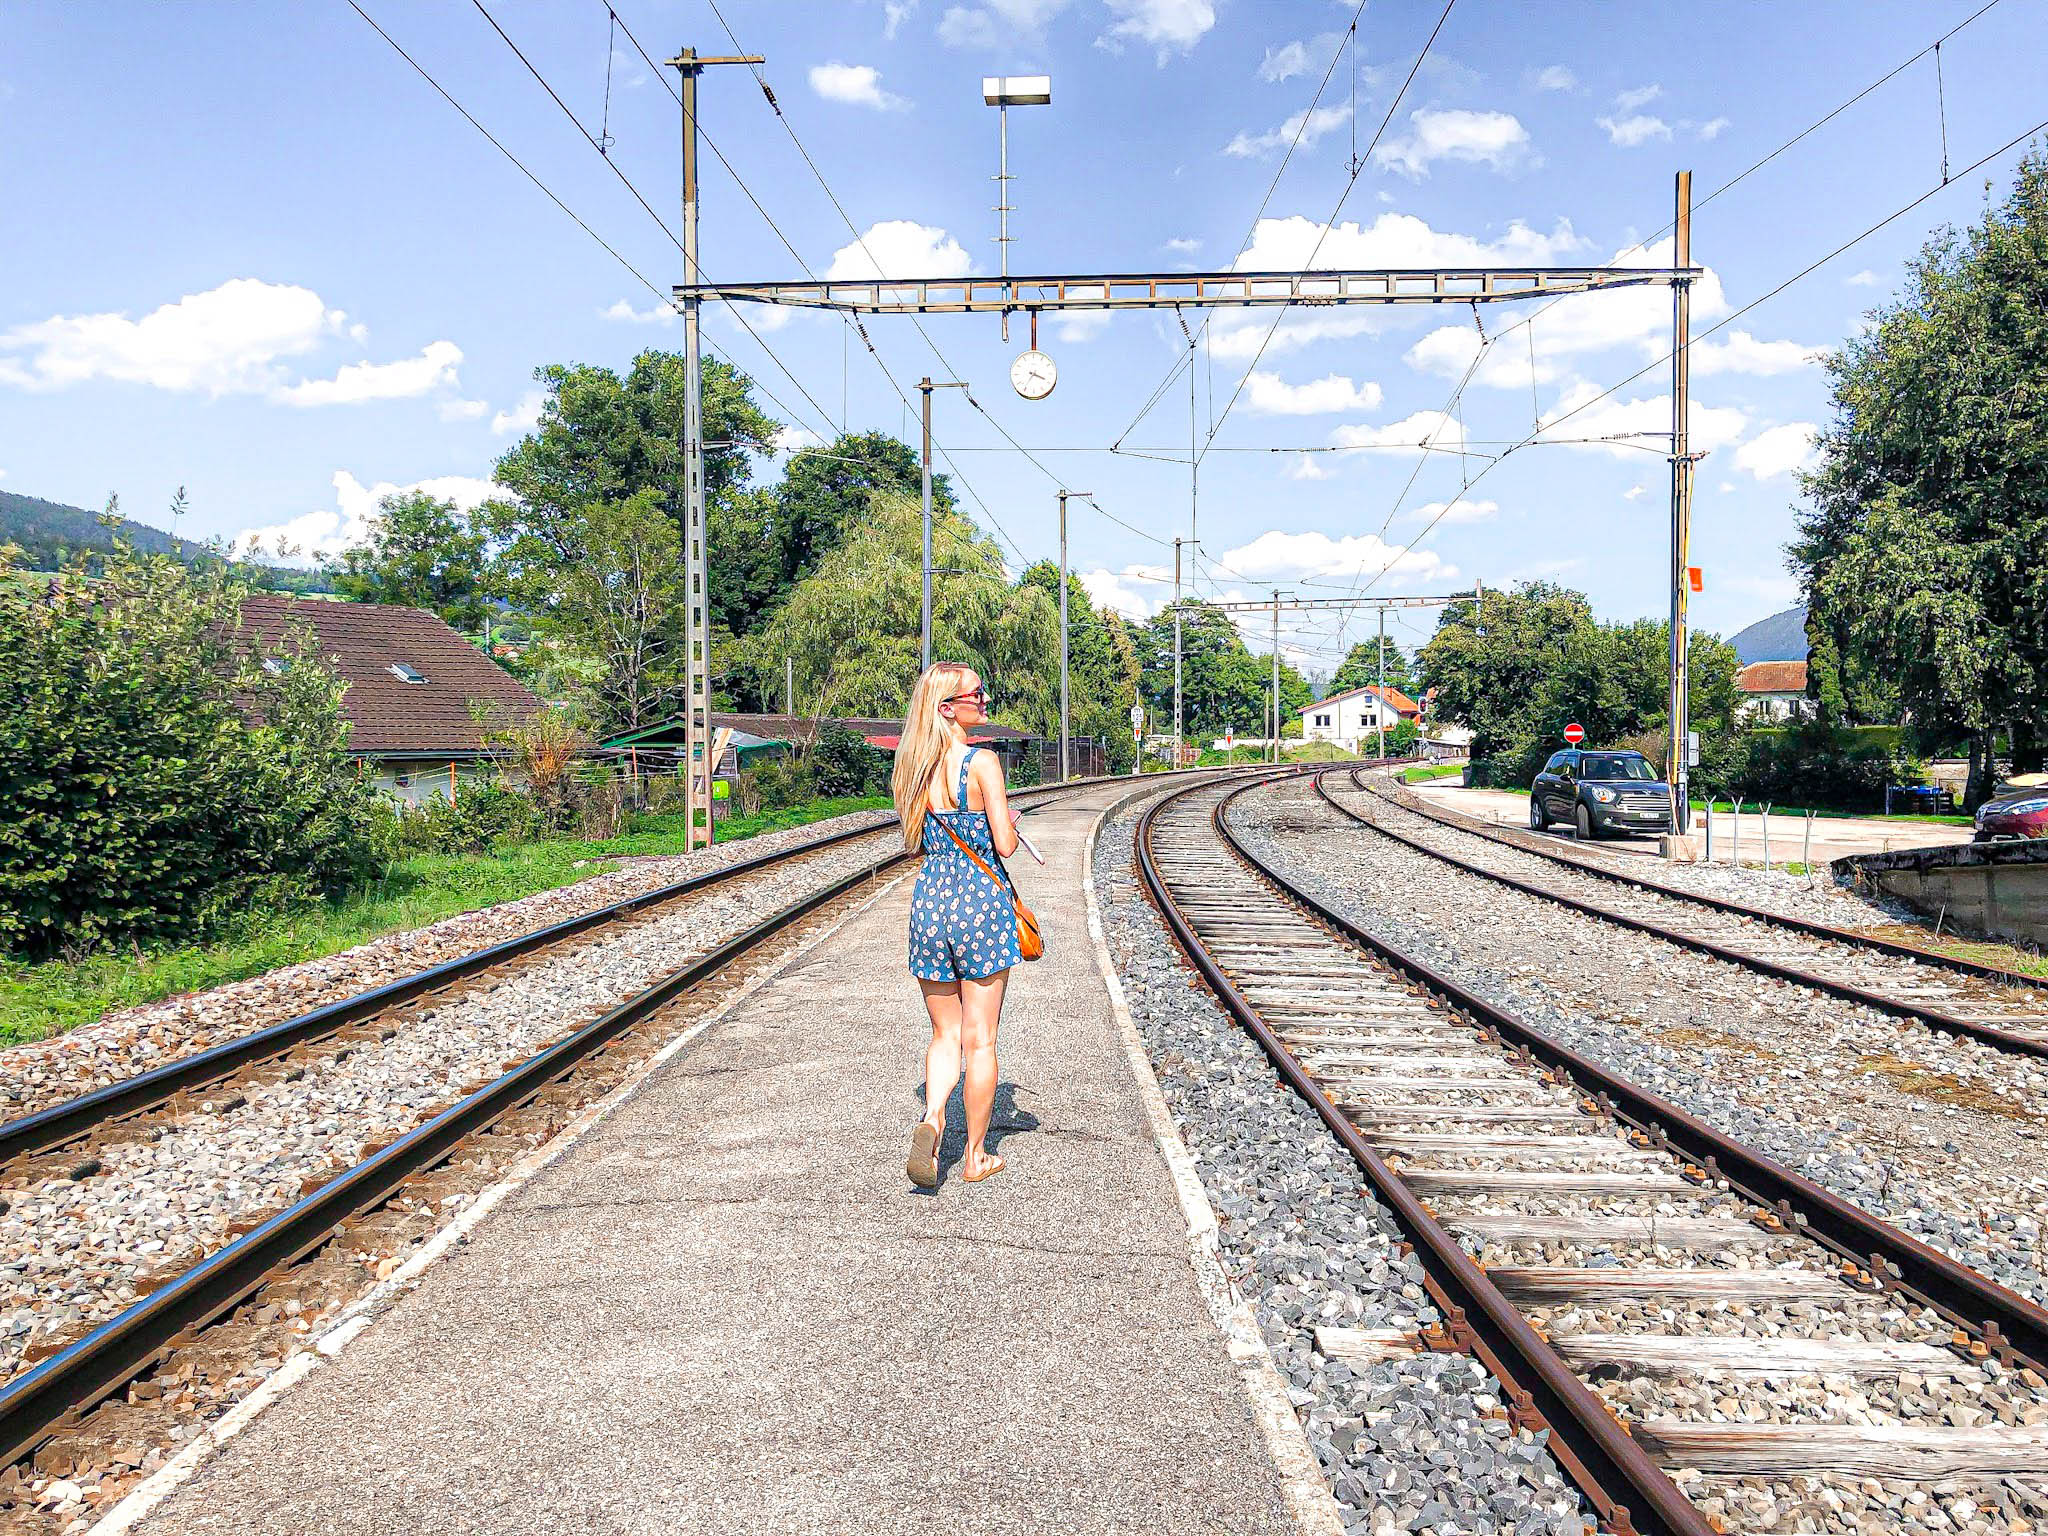 Train station in Motiers, Switzerland